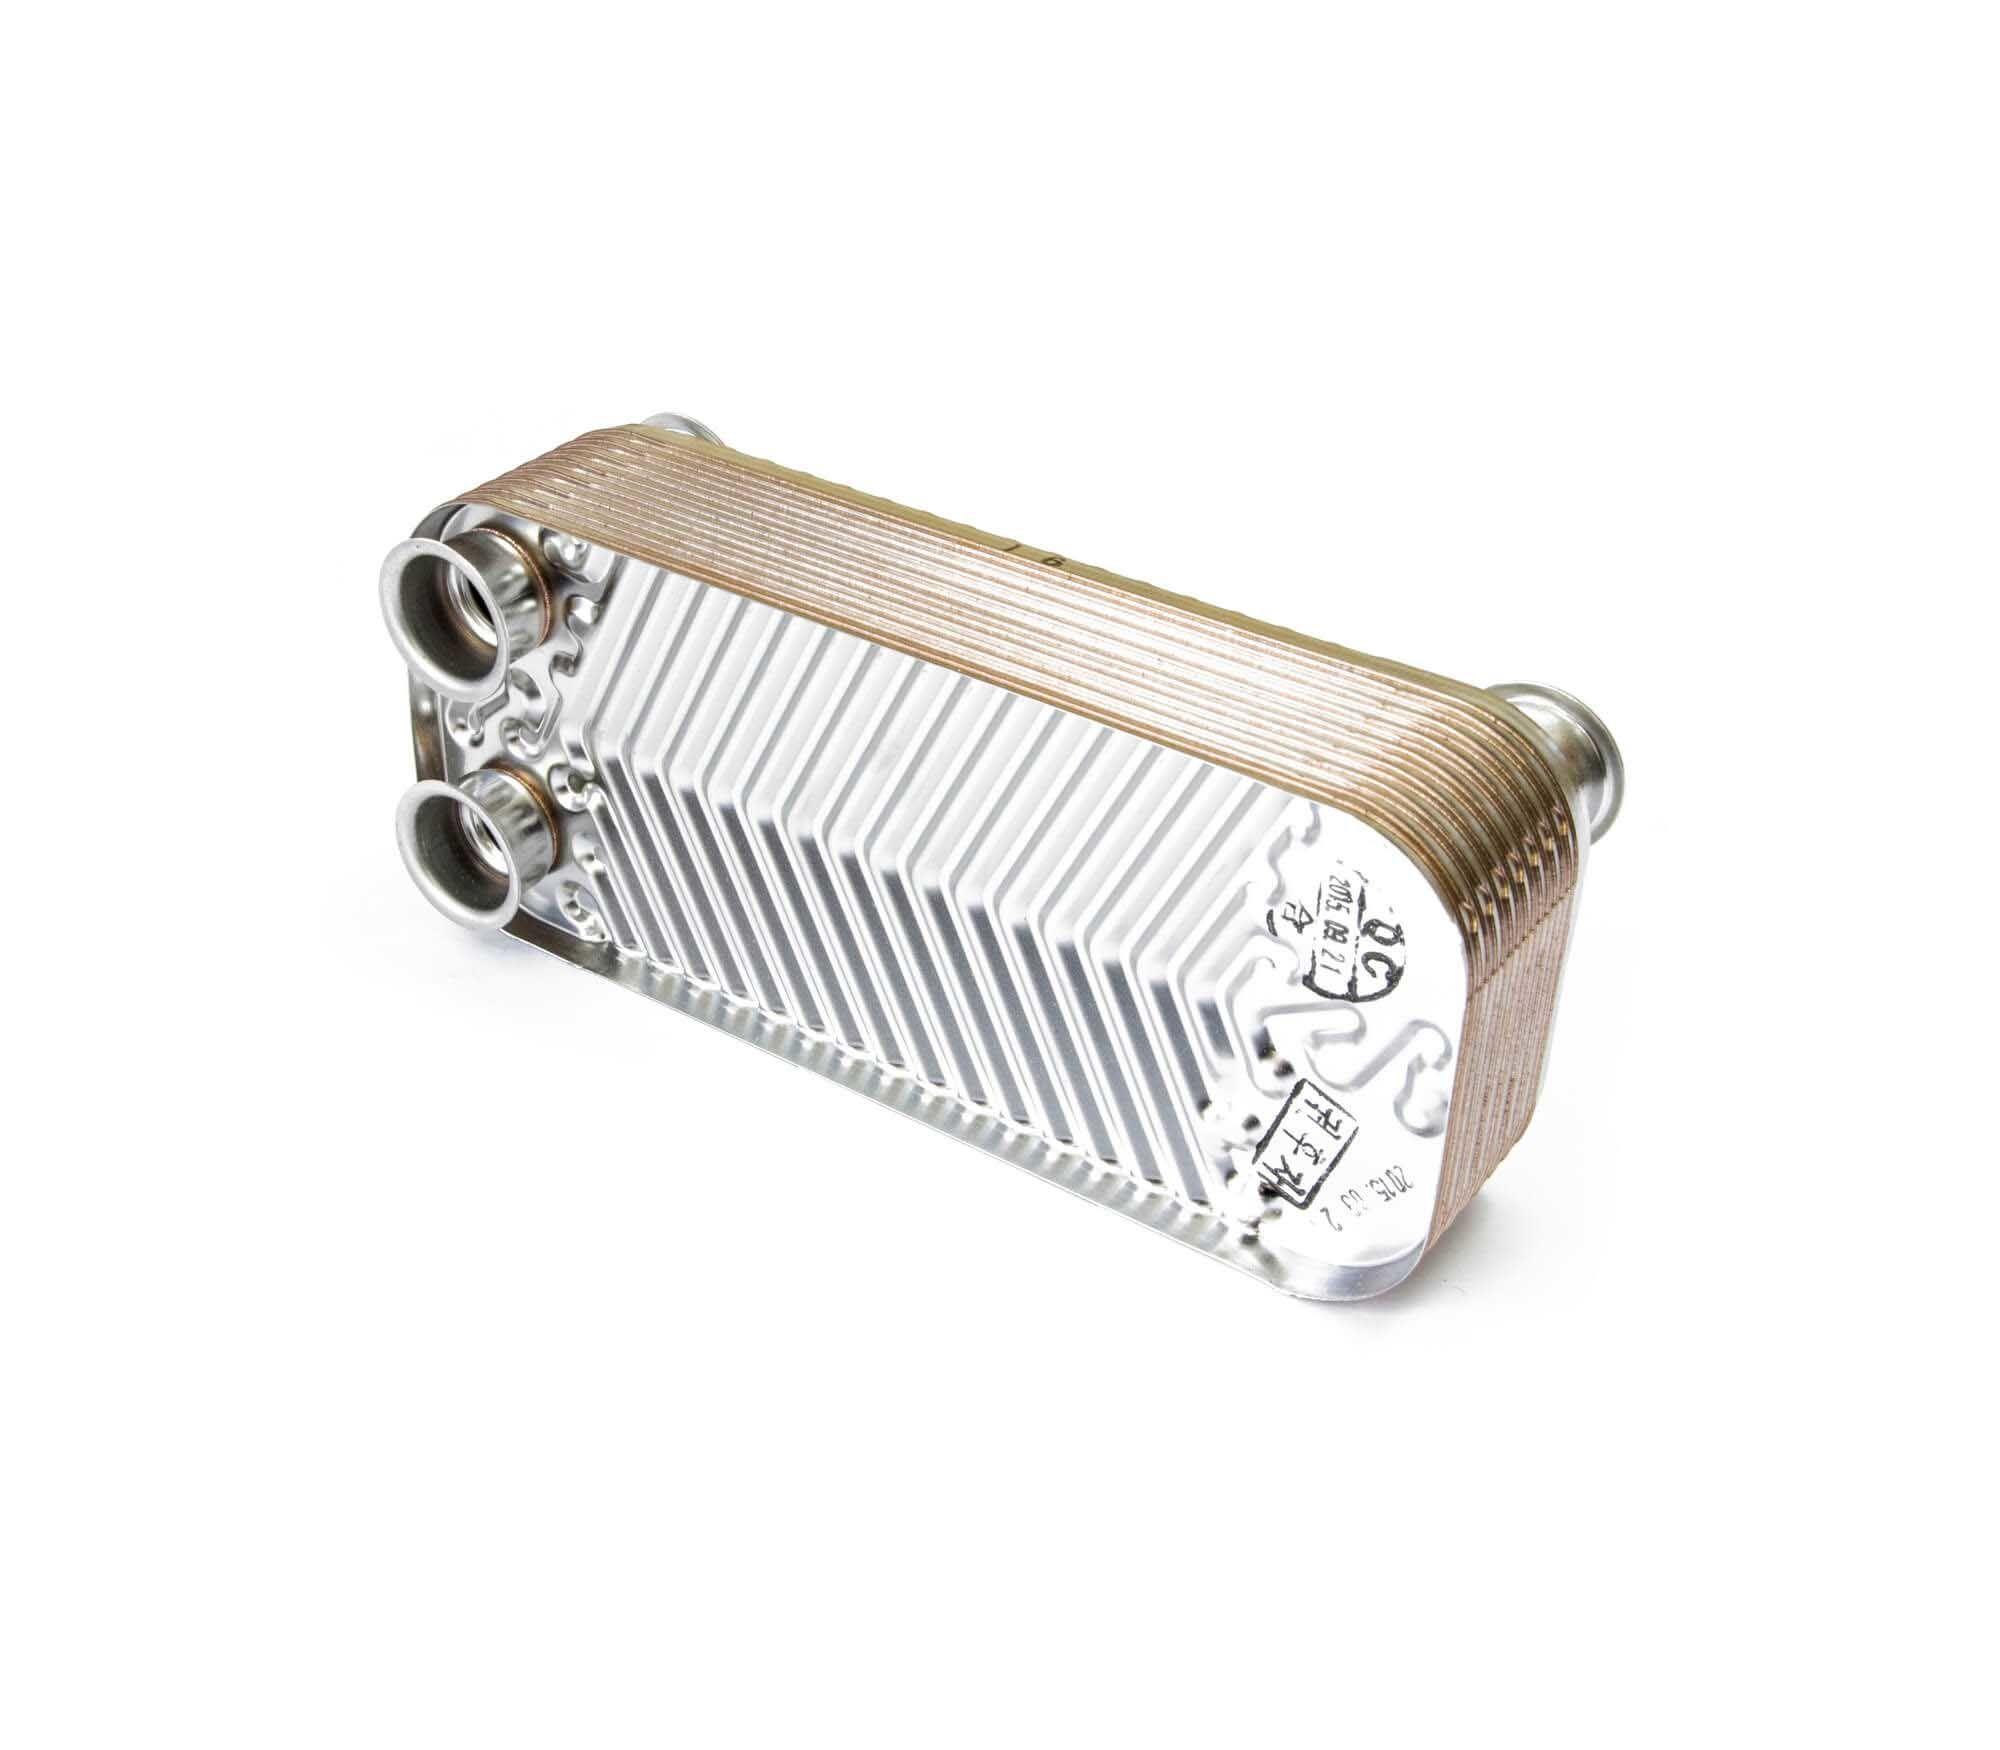 Теплообменник на део газбойлер Пластины теплообменника Tranter GC-009 P Сарапул